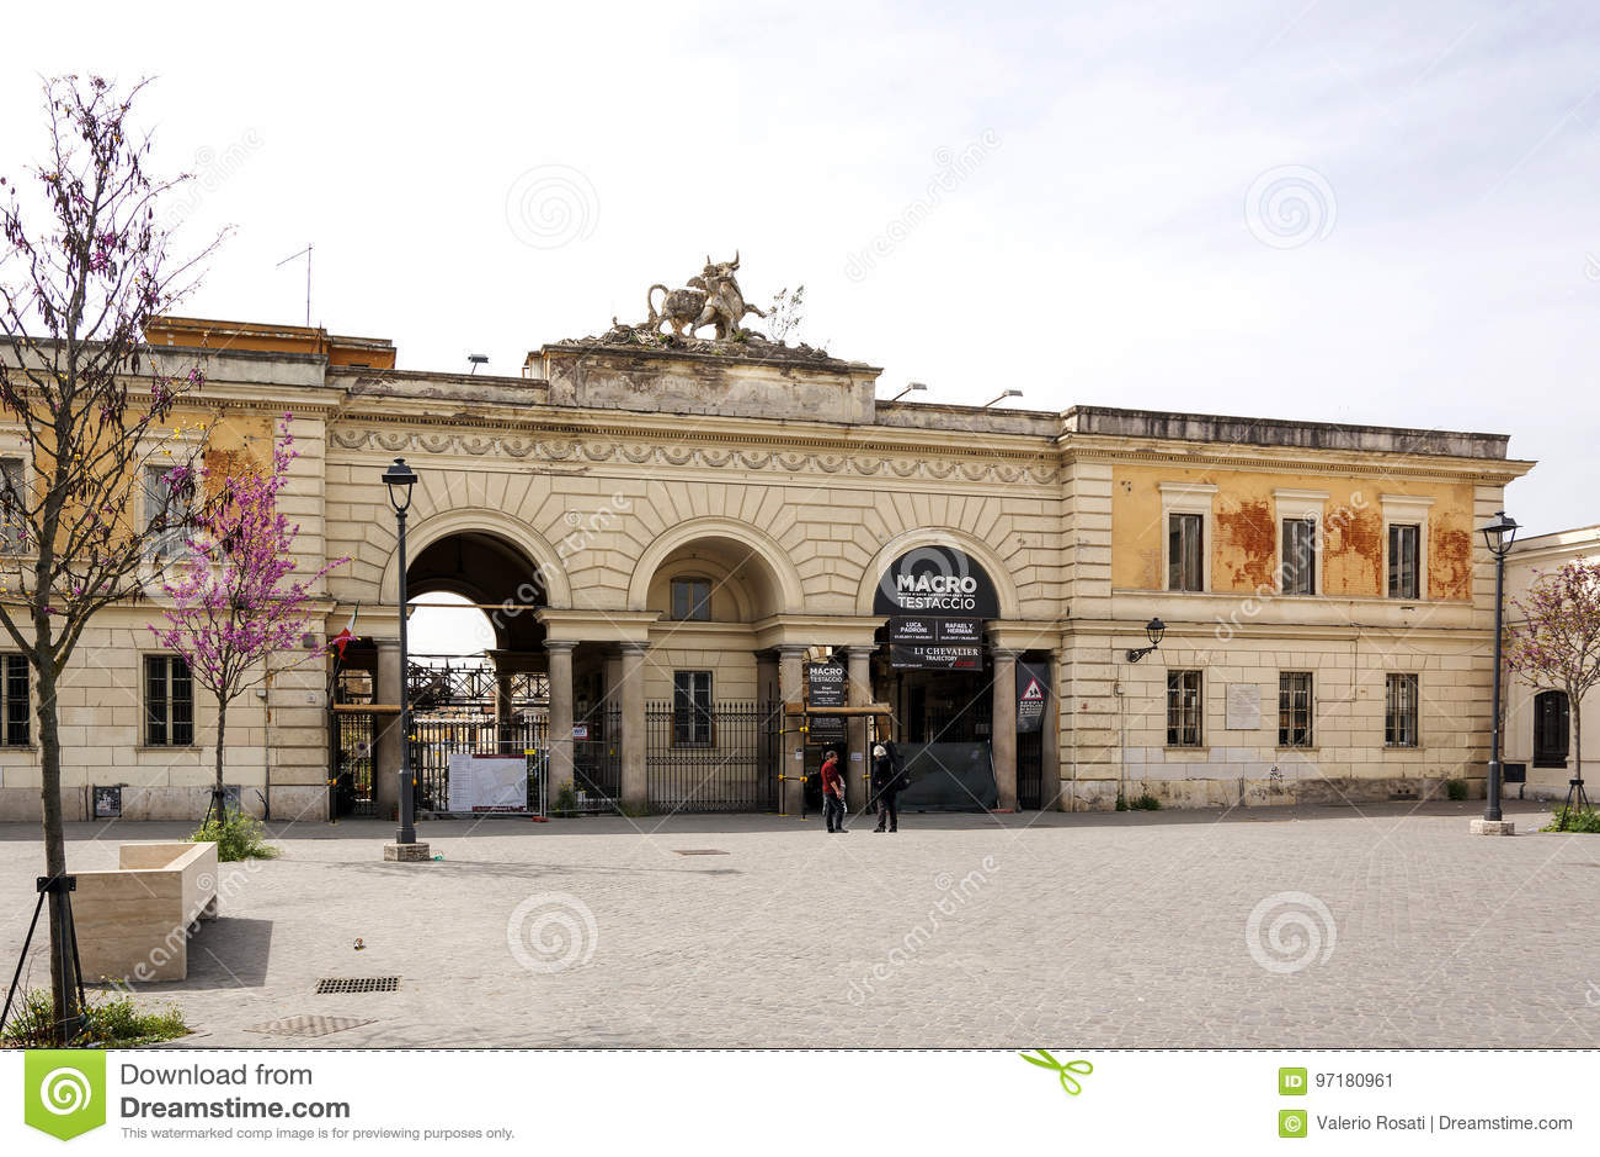 MACRO Testaccio. Museum Of Contemporary Art Of Rome ...